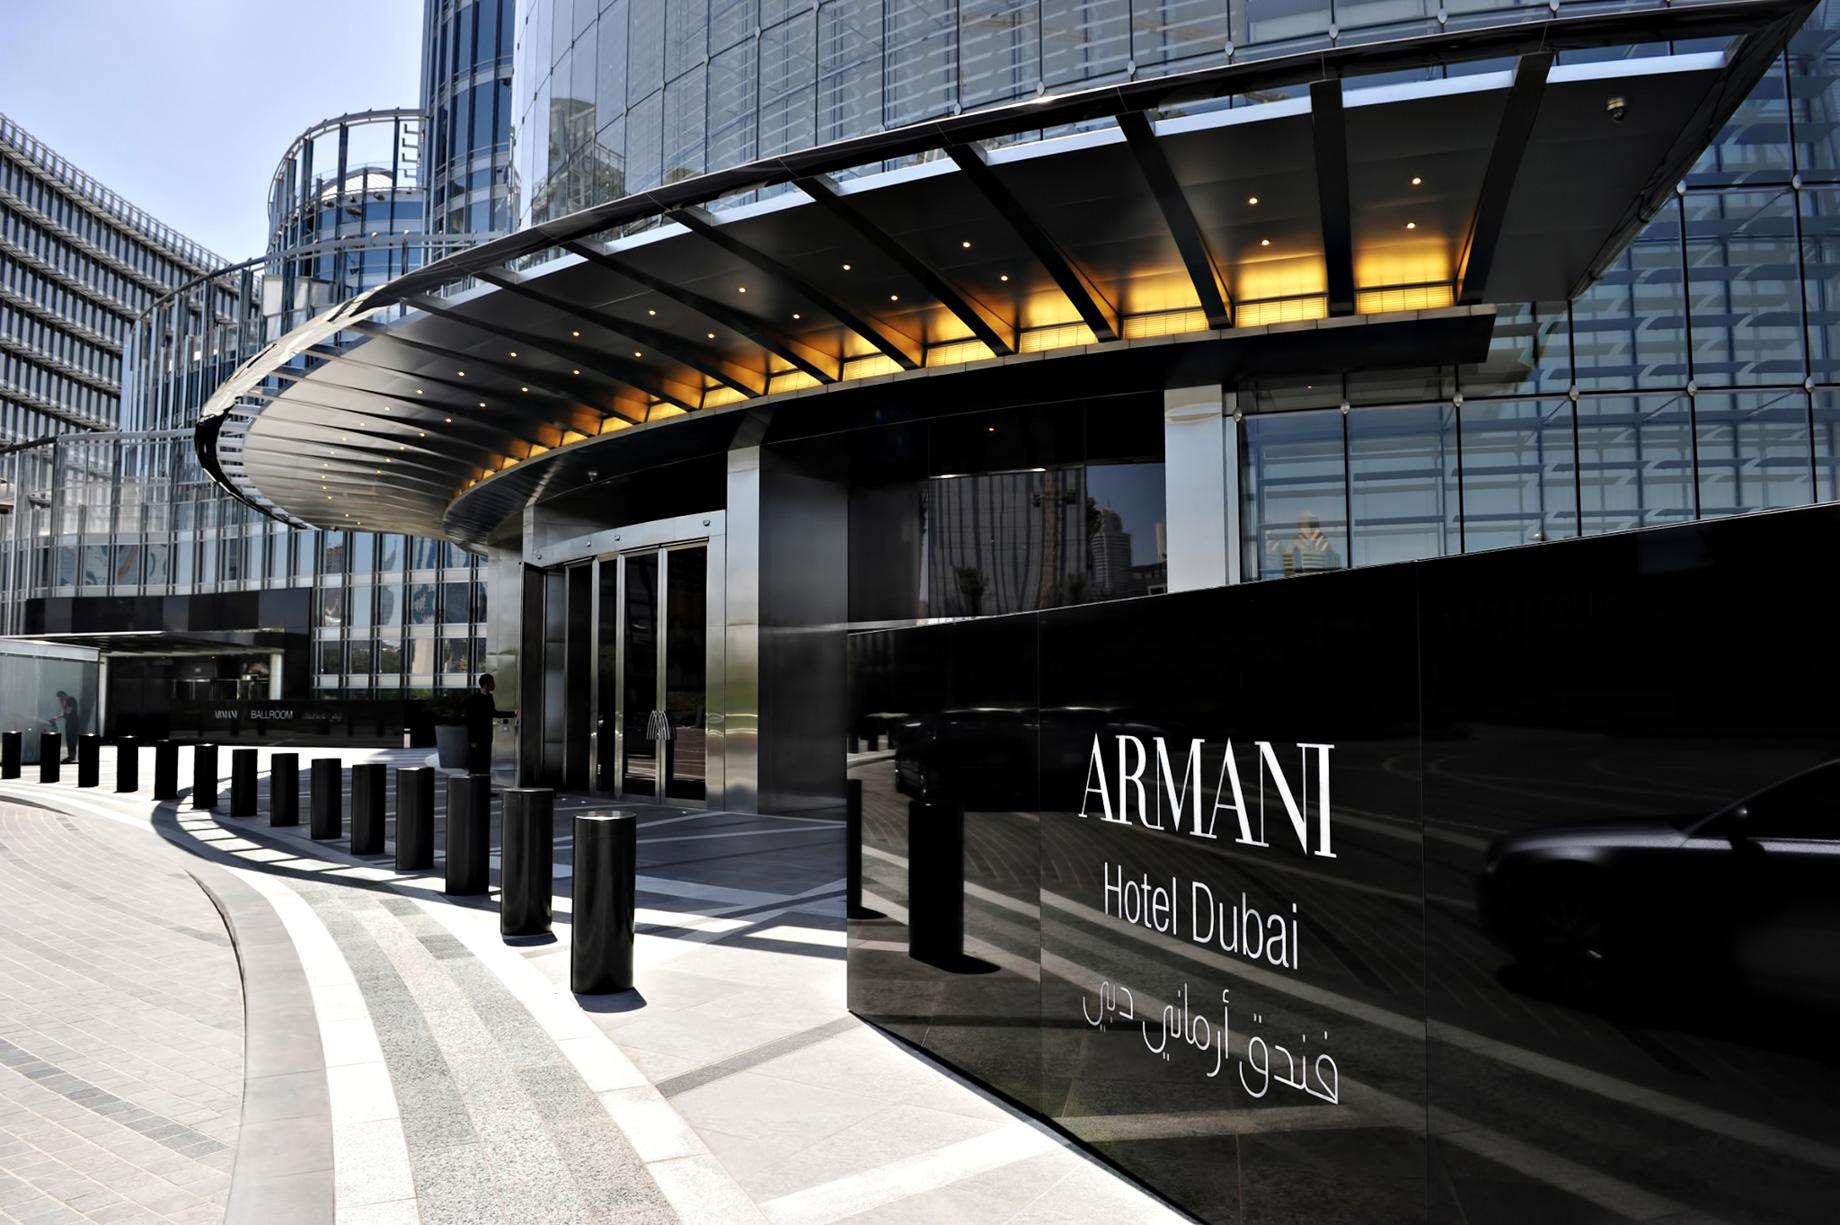 Armani Hotel Dubai - Burj Khalifa, Dubai, UAE